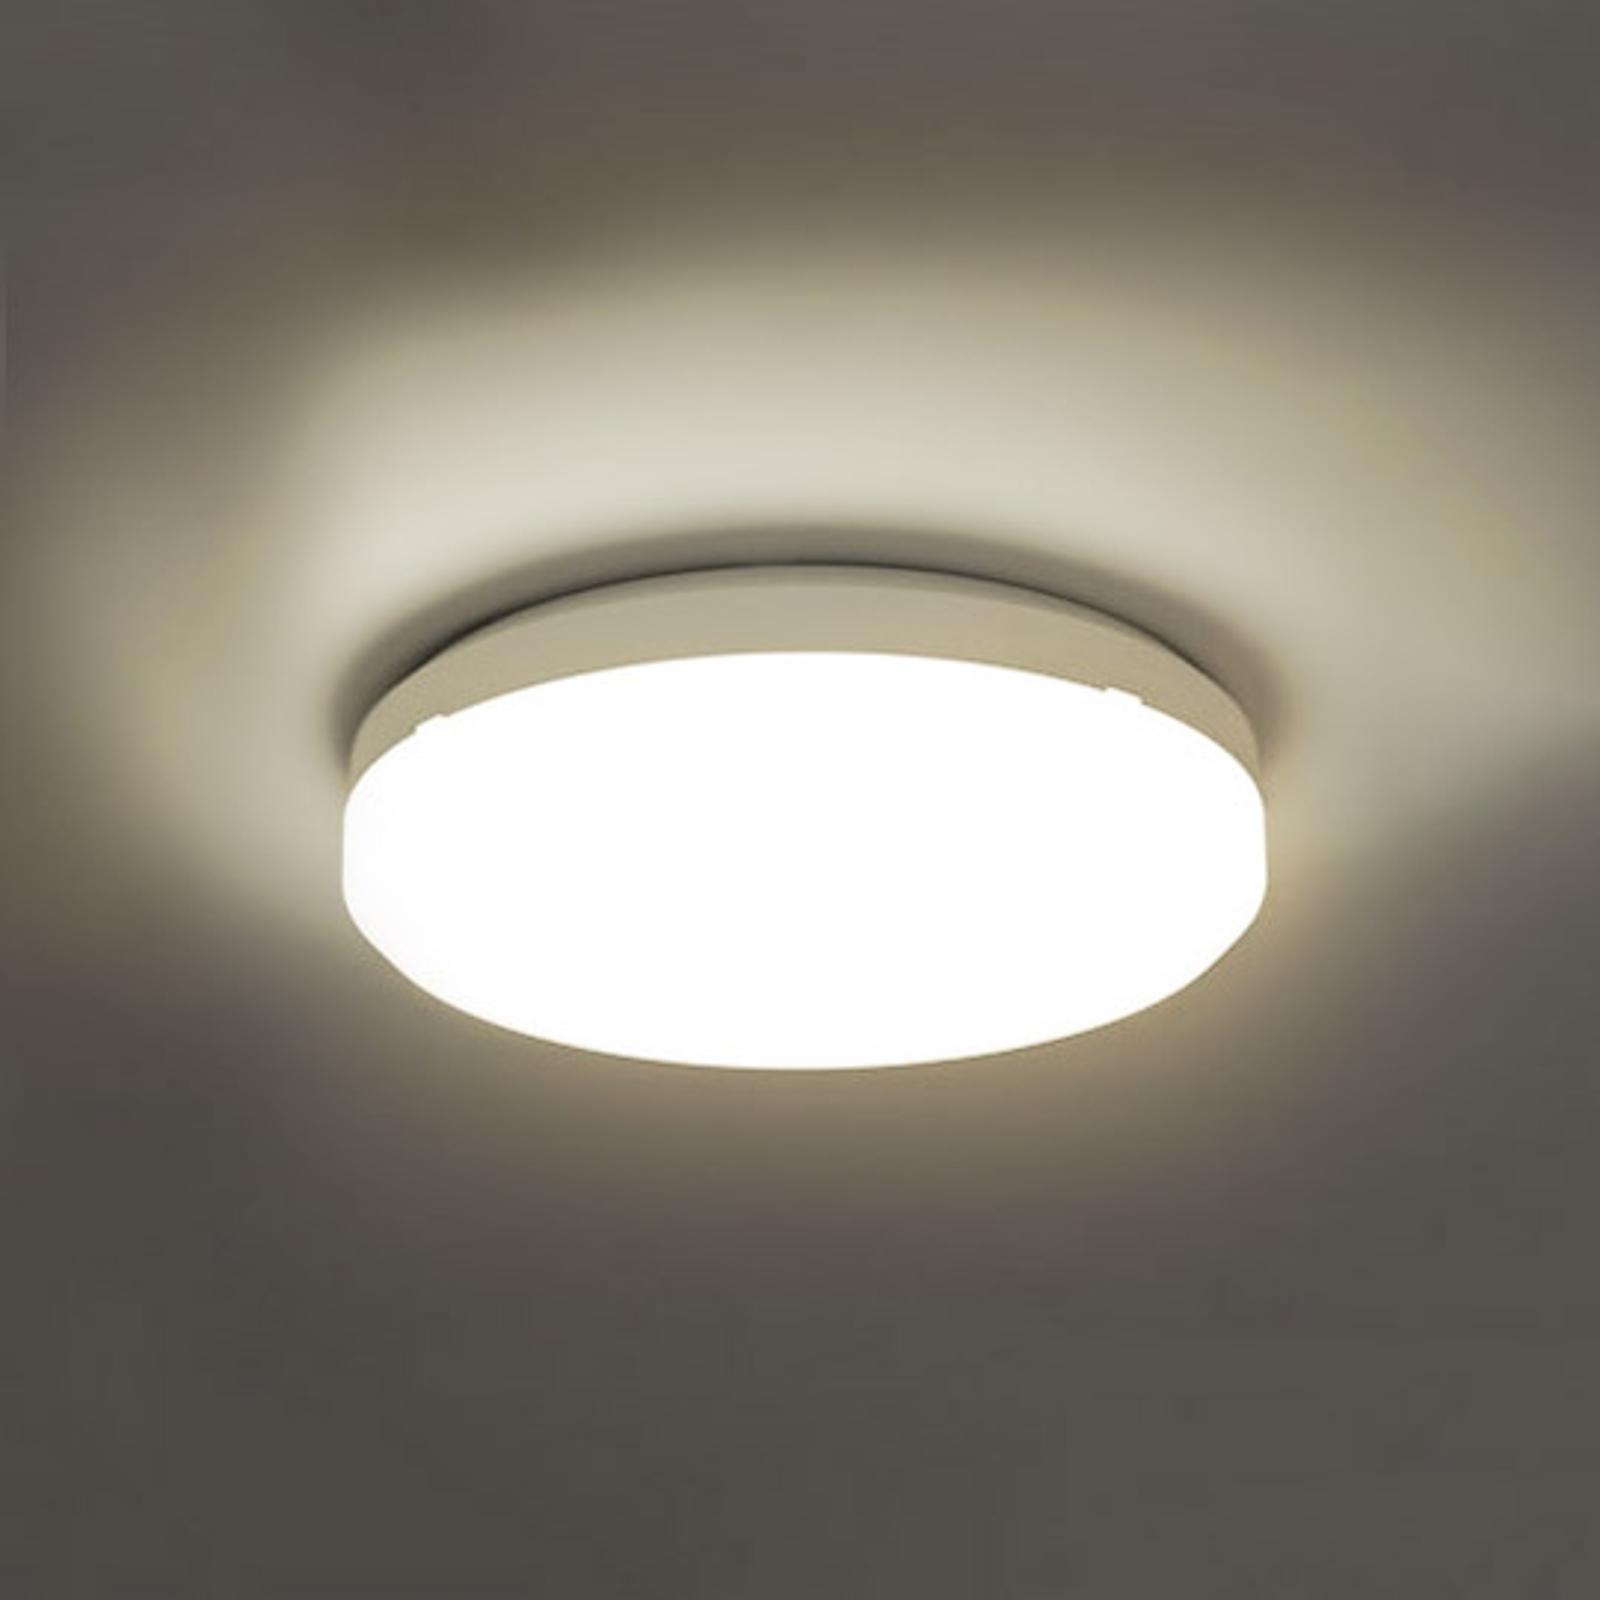 Sun 15 - lámpara LED de techo IP65, 18 W 3000K ww